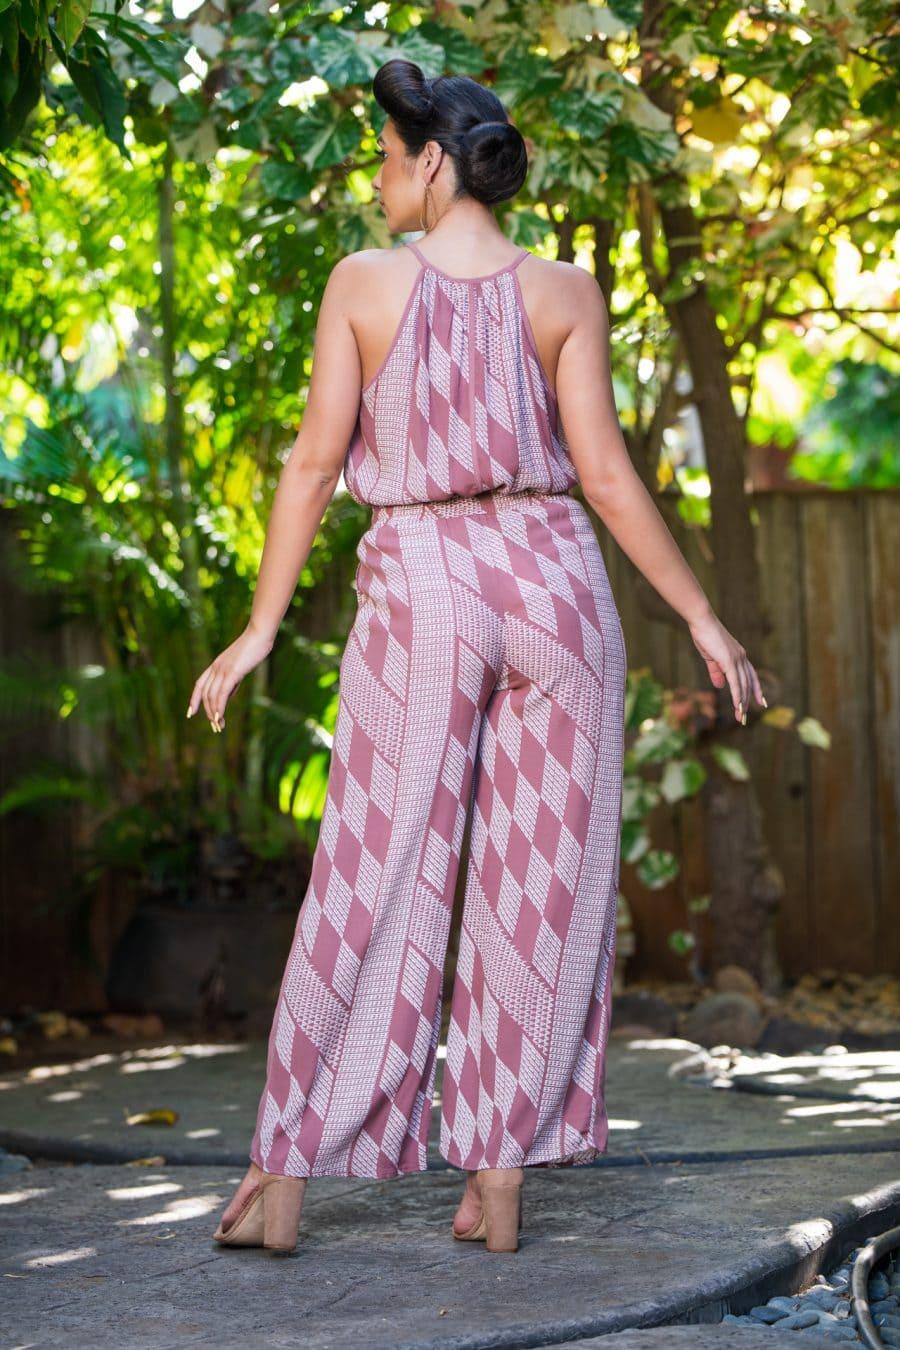 Model wearing Ola Pant in Fired Brick White Kamehahema Pattern - Back View